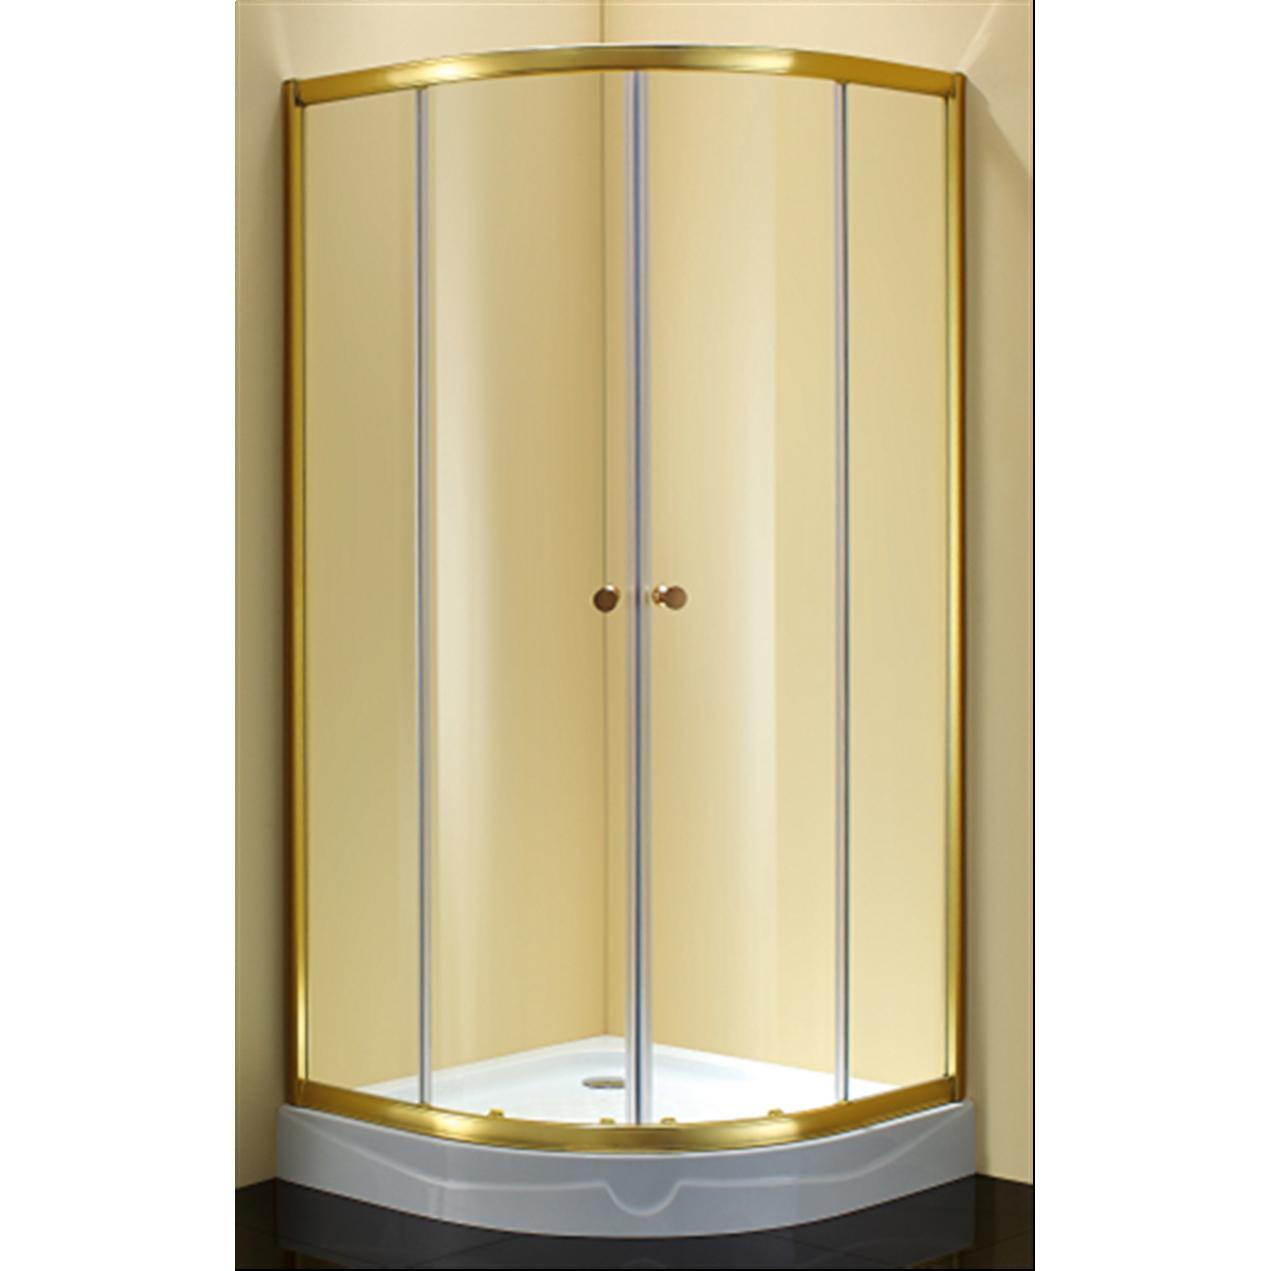 Душевой уголок Sturm Gallery 90x90х190 профиль золото душевой поддон sturm gallery 100х100х14 black